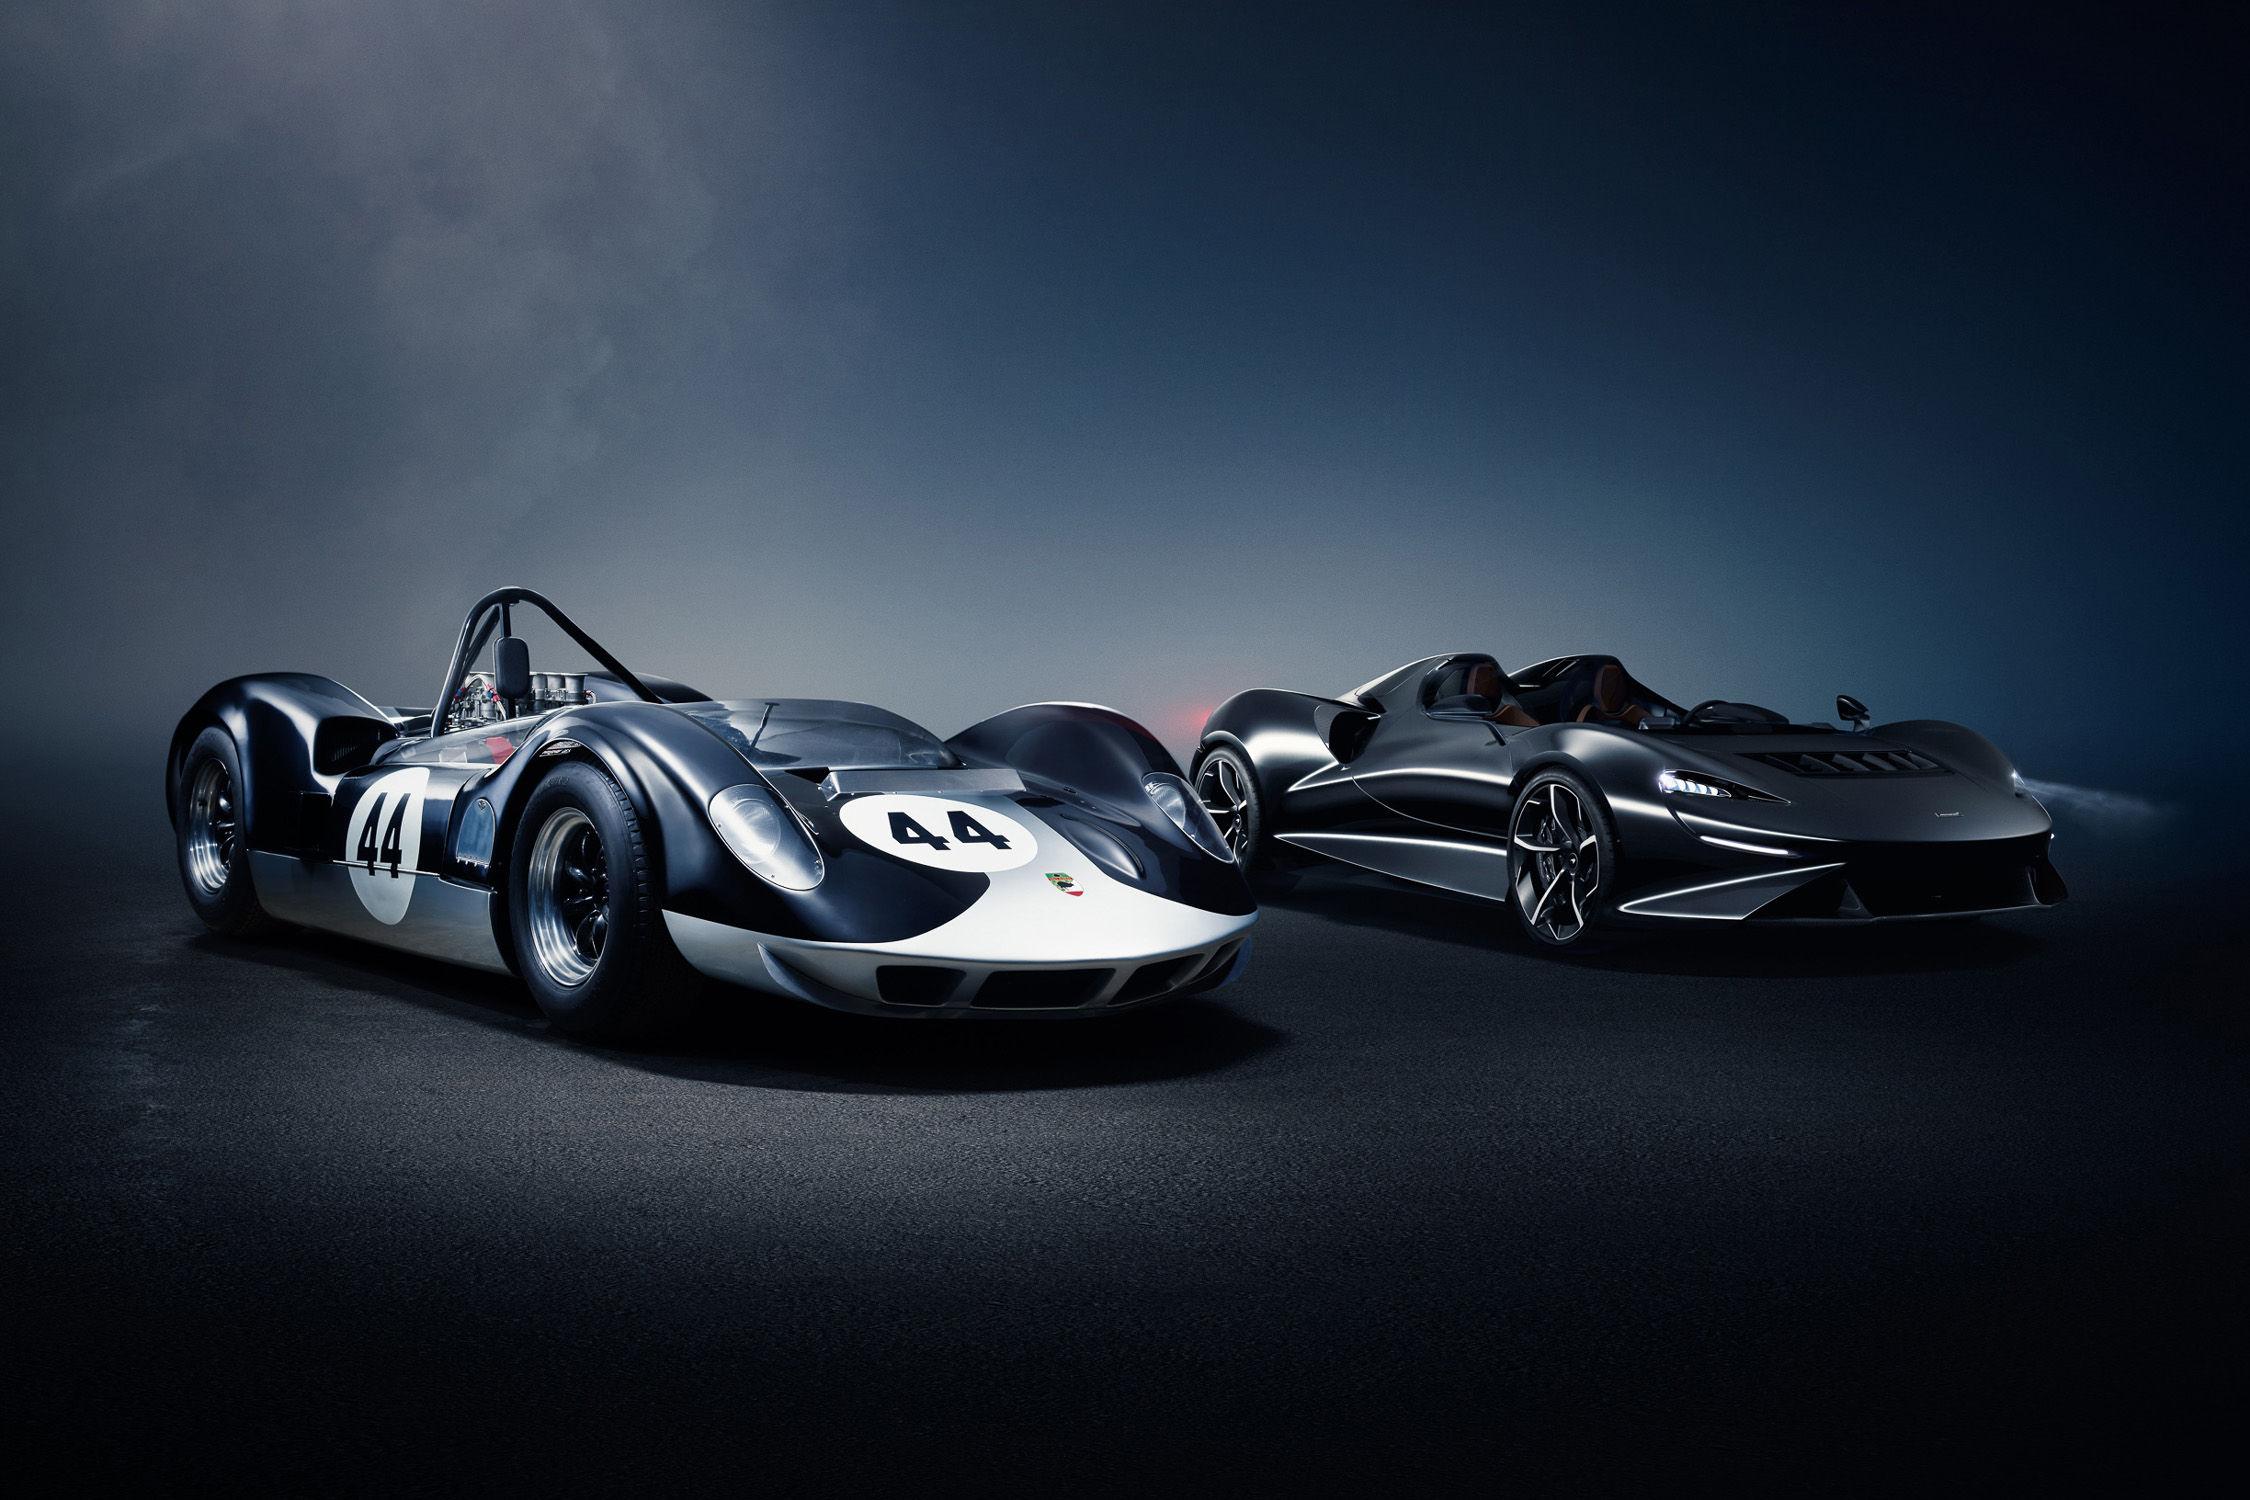 La barchetta des temps modernes — McLaren Elva